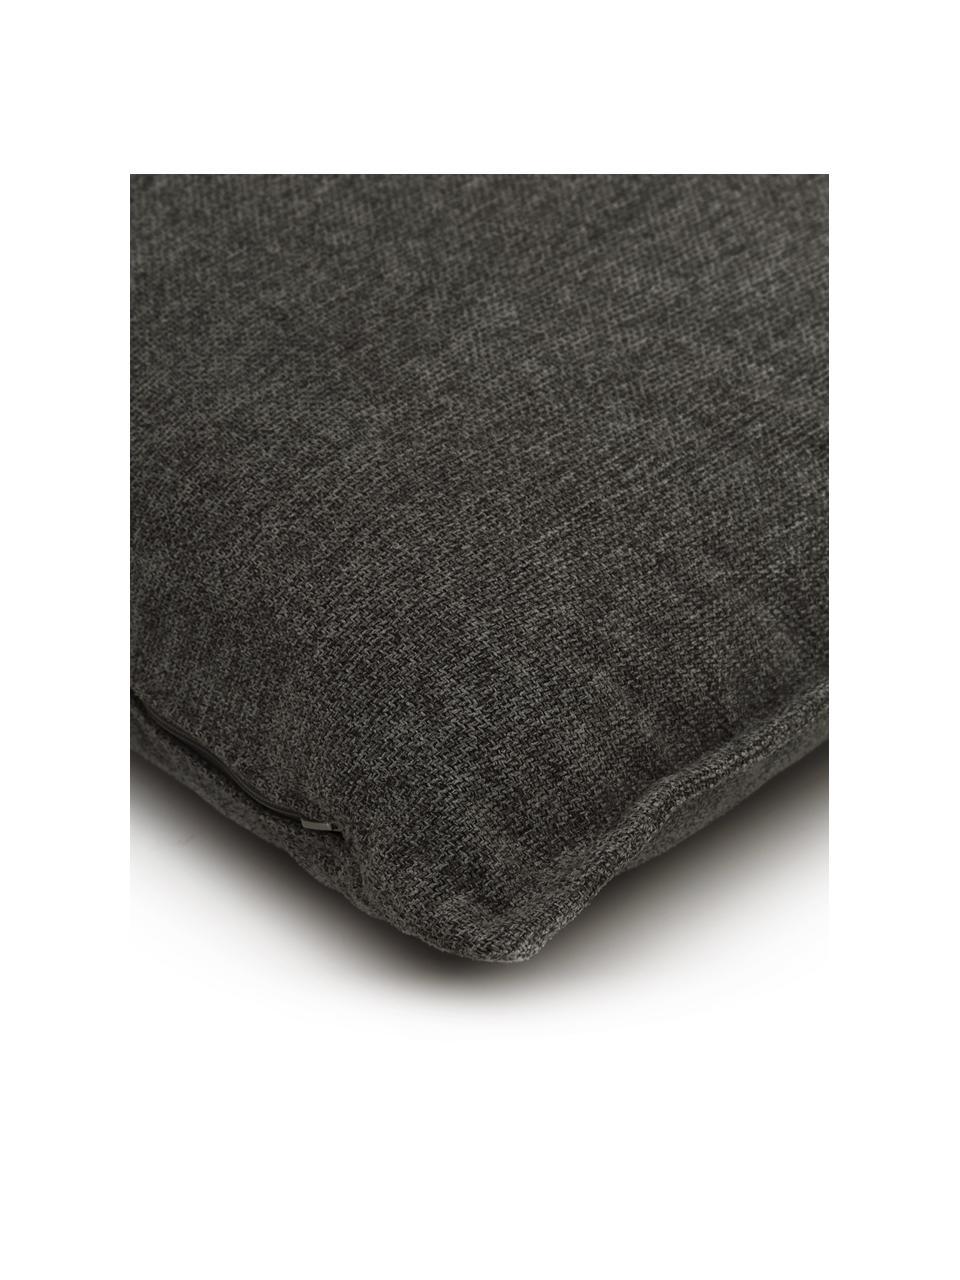 Sofa-Kissen Lennon in Anthrazit, Bezug: 100% Polyester, Webstoff Anthrazit, 60 x 60 cm